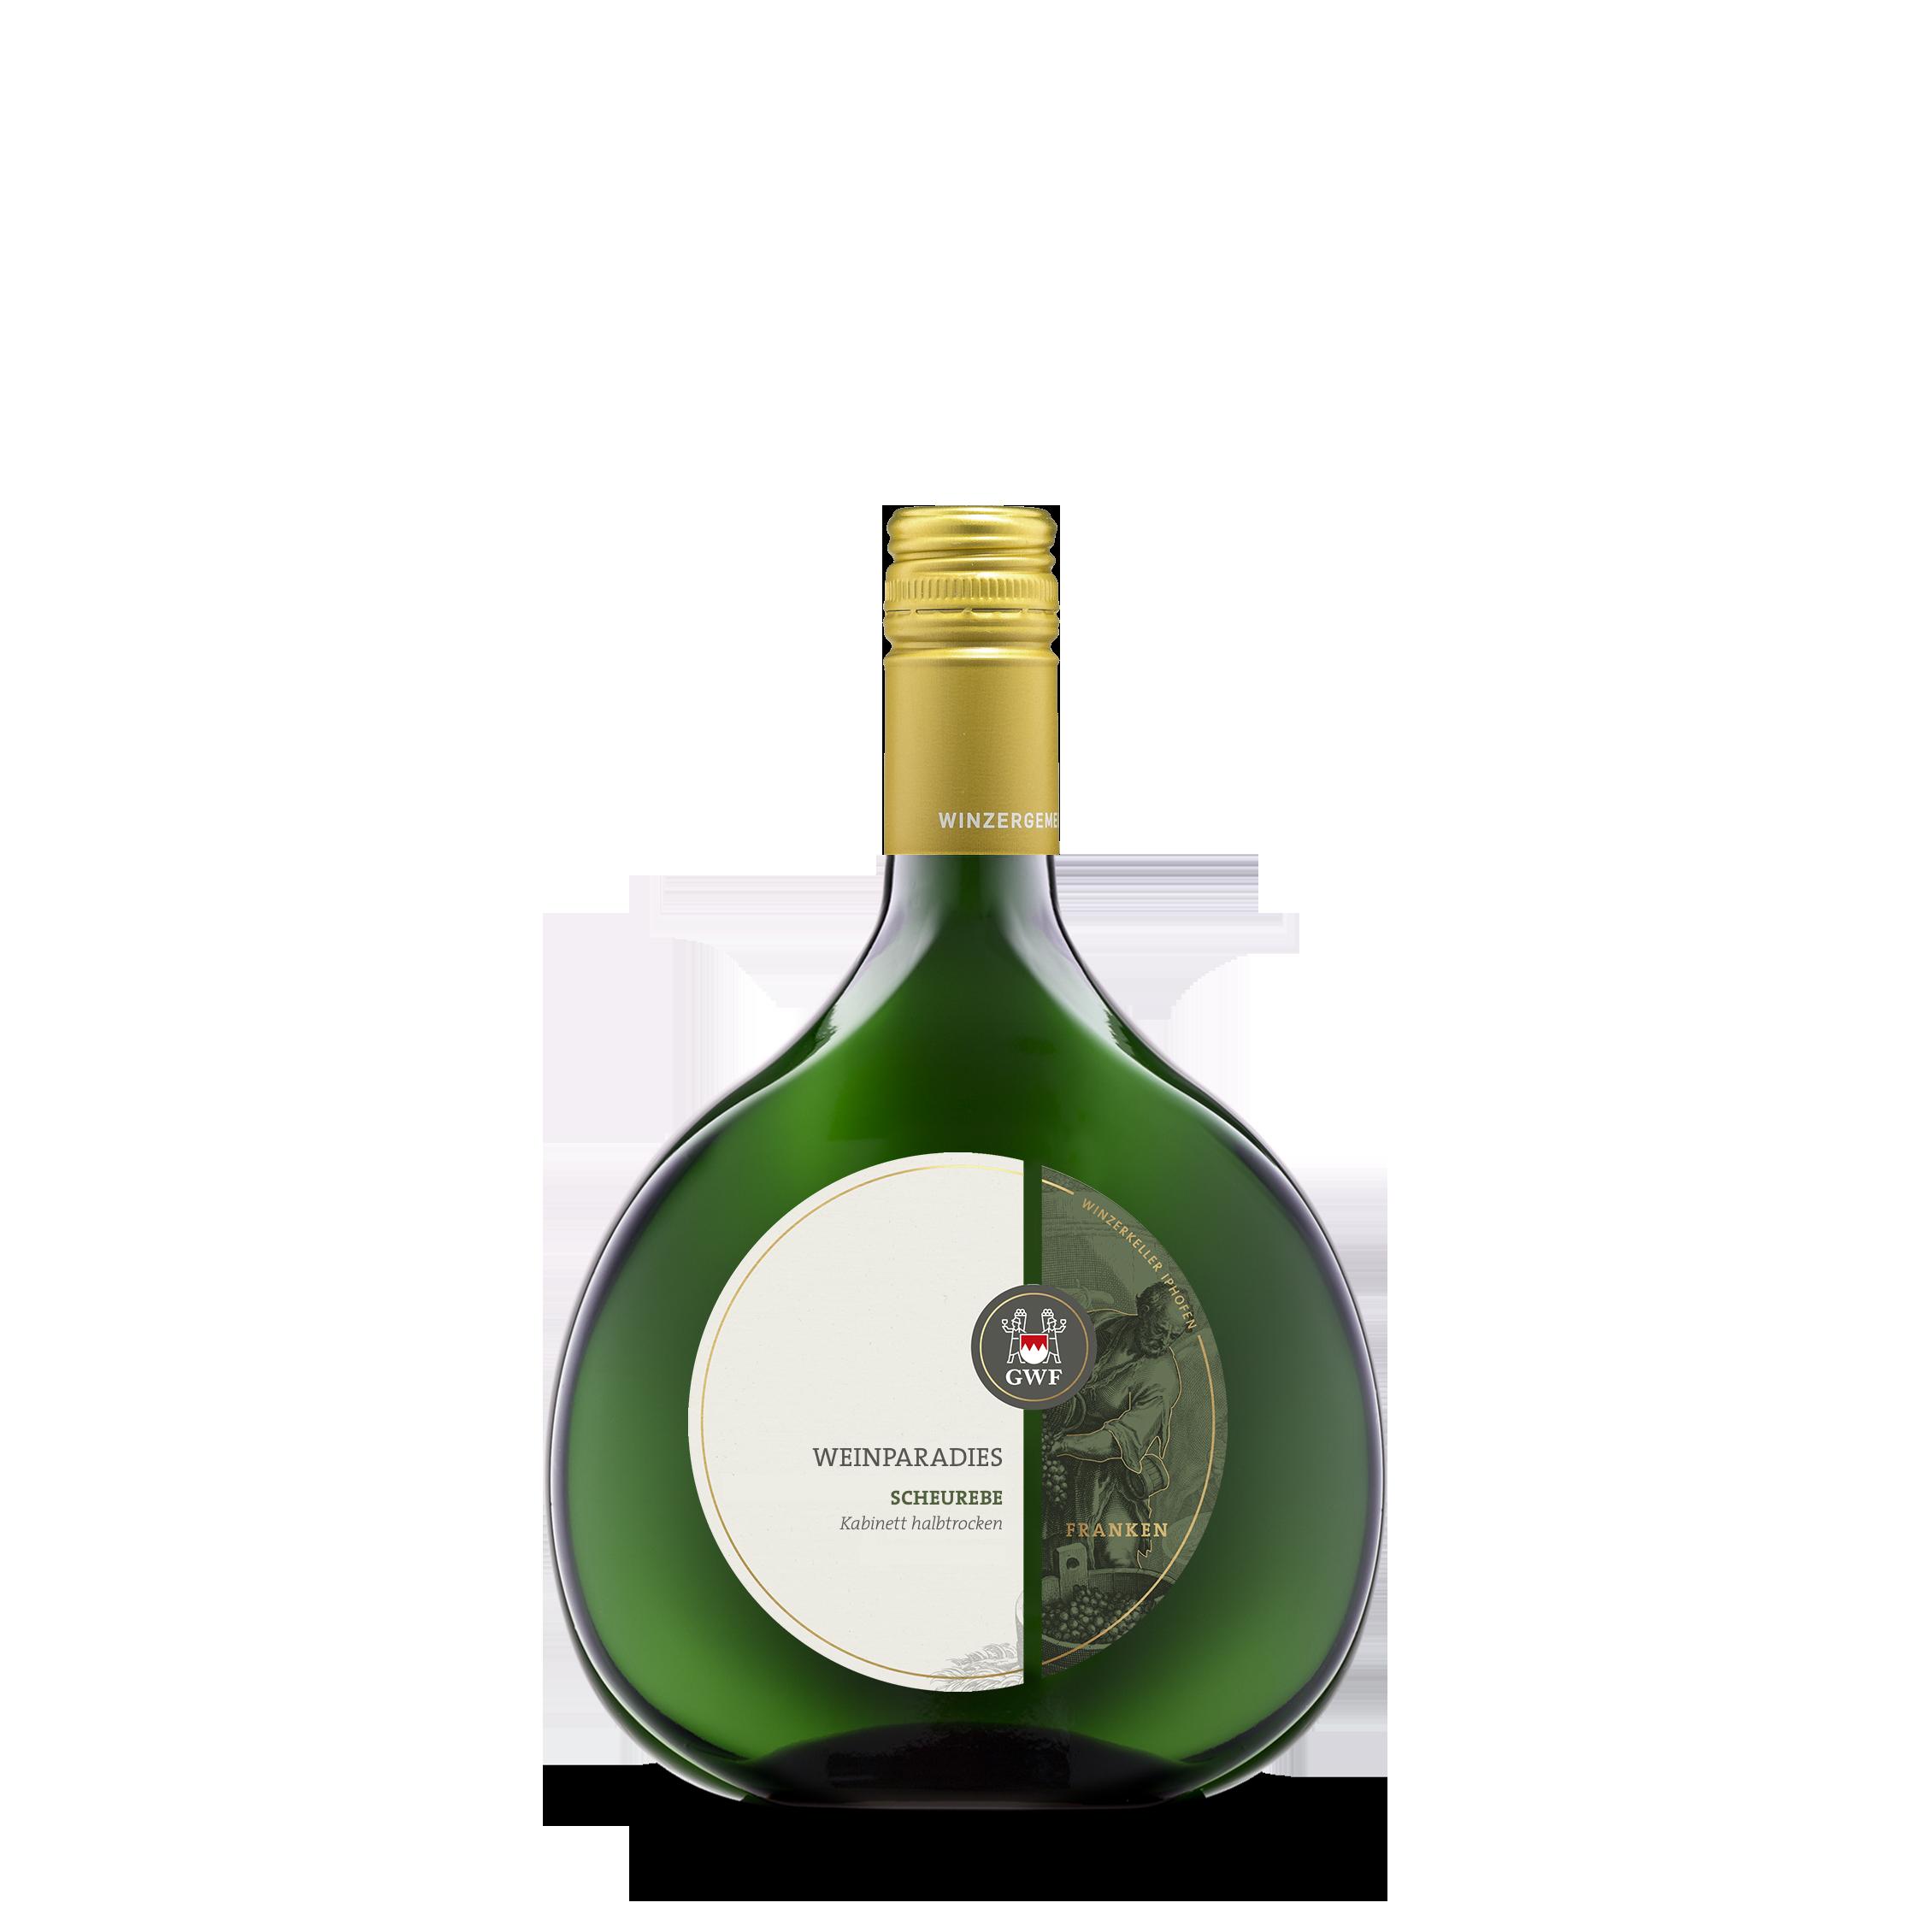 Weinparadies